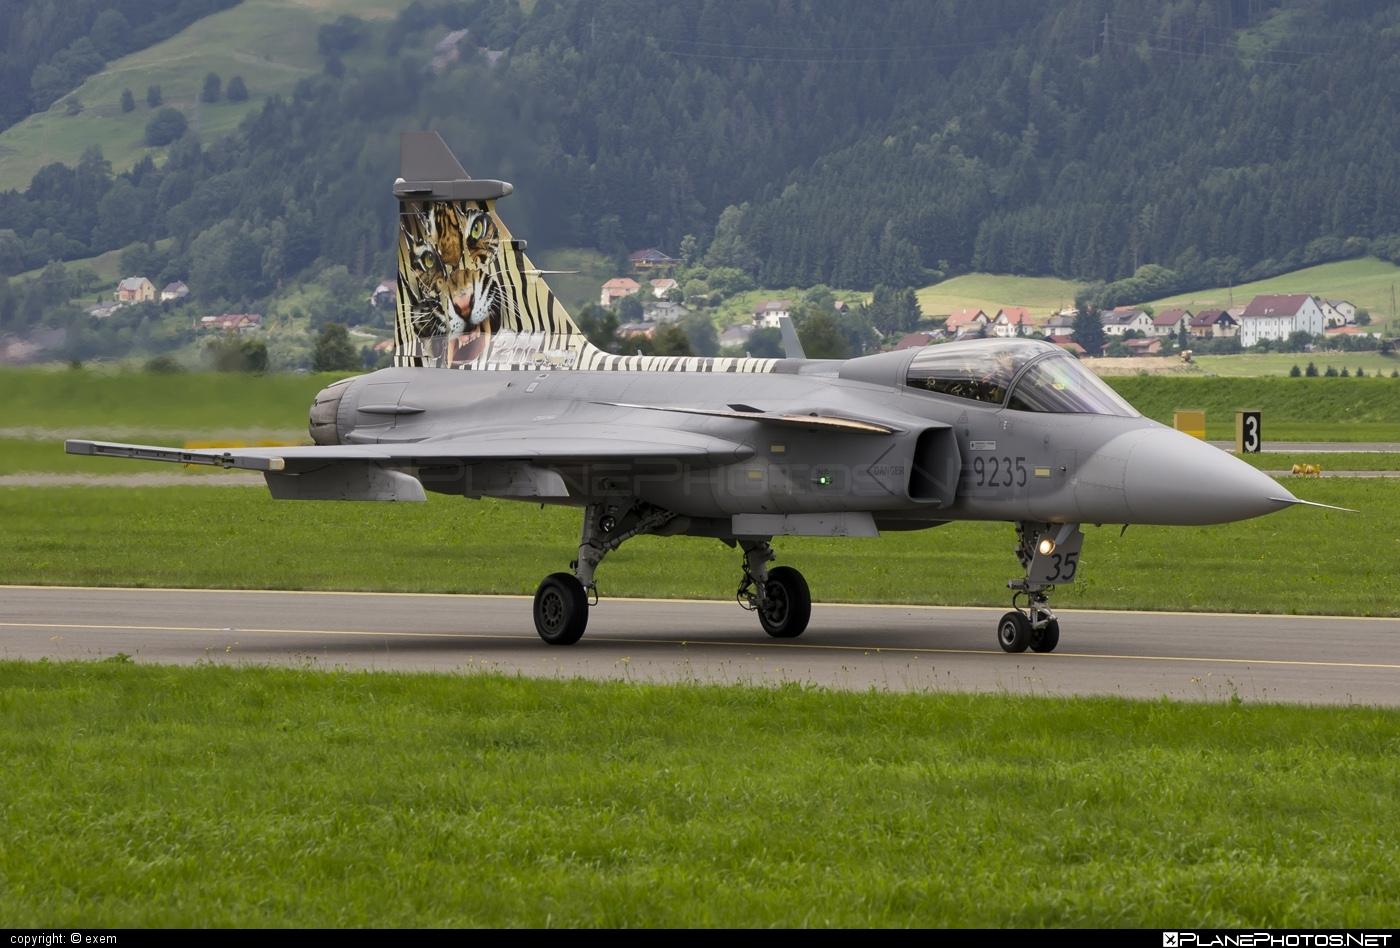 Saab JAS 39C Gripen - 9235 operated by Vzdušné síly AČR (Czech Air Force) #czechairforce #gripen #jas39 #jas39c #jas39gripen #saab #vzdusnesilyacr